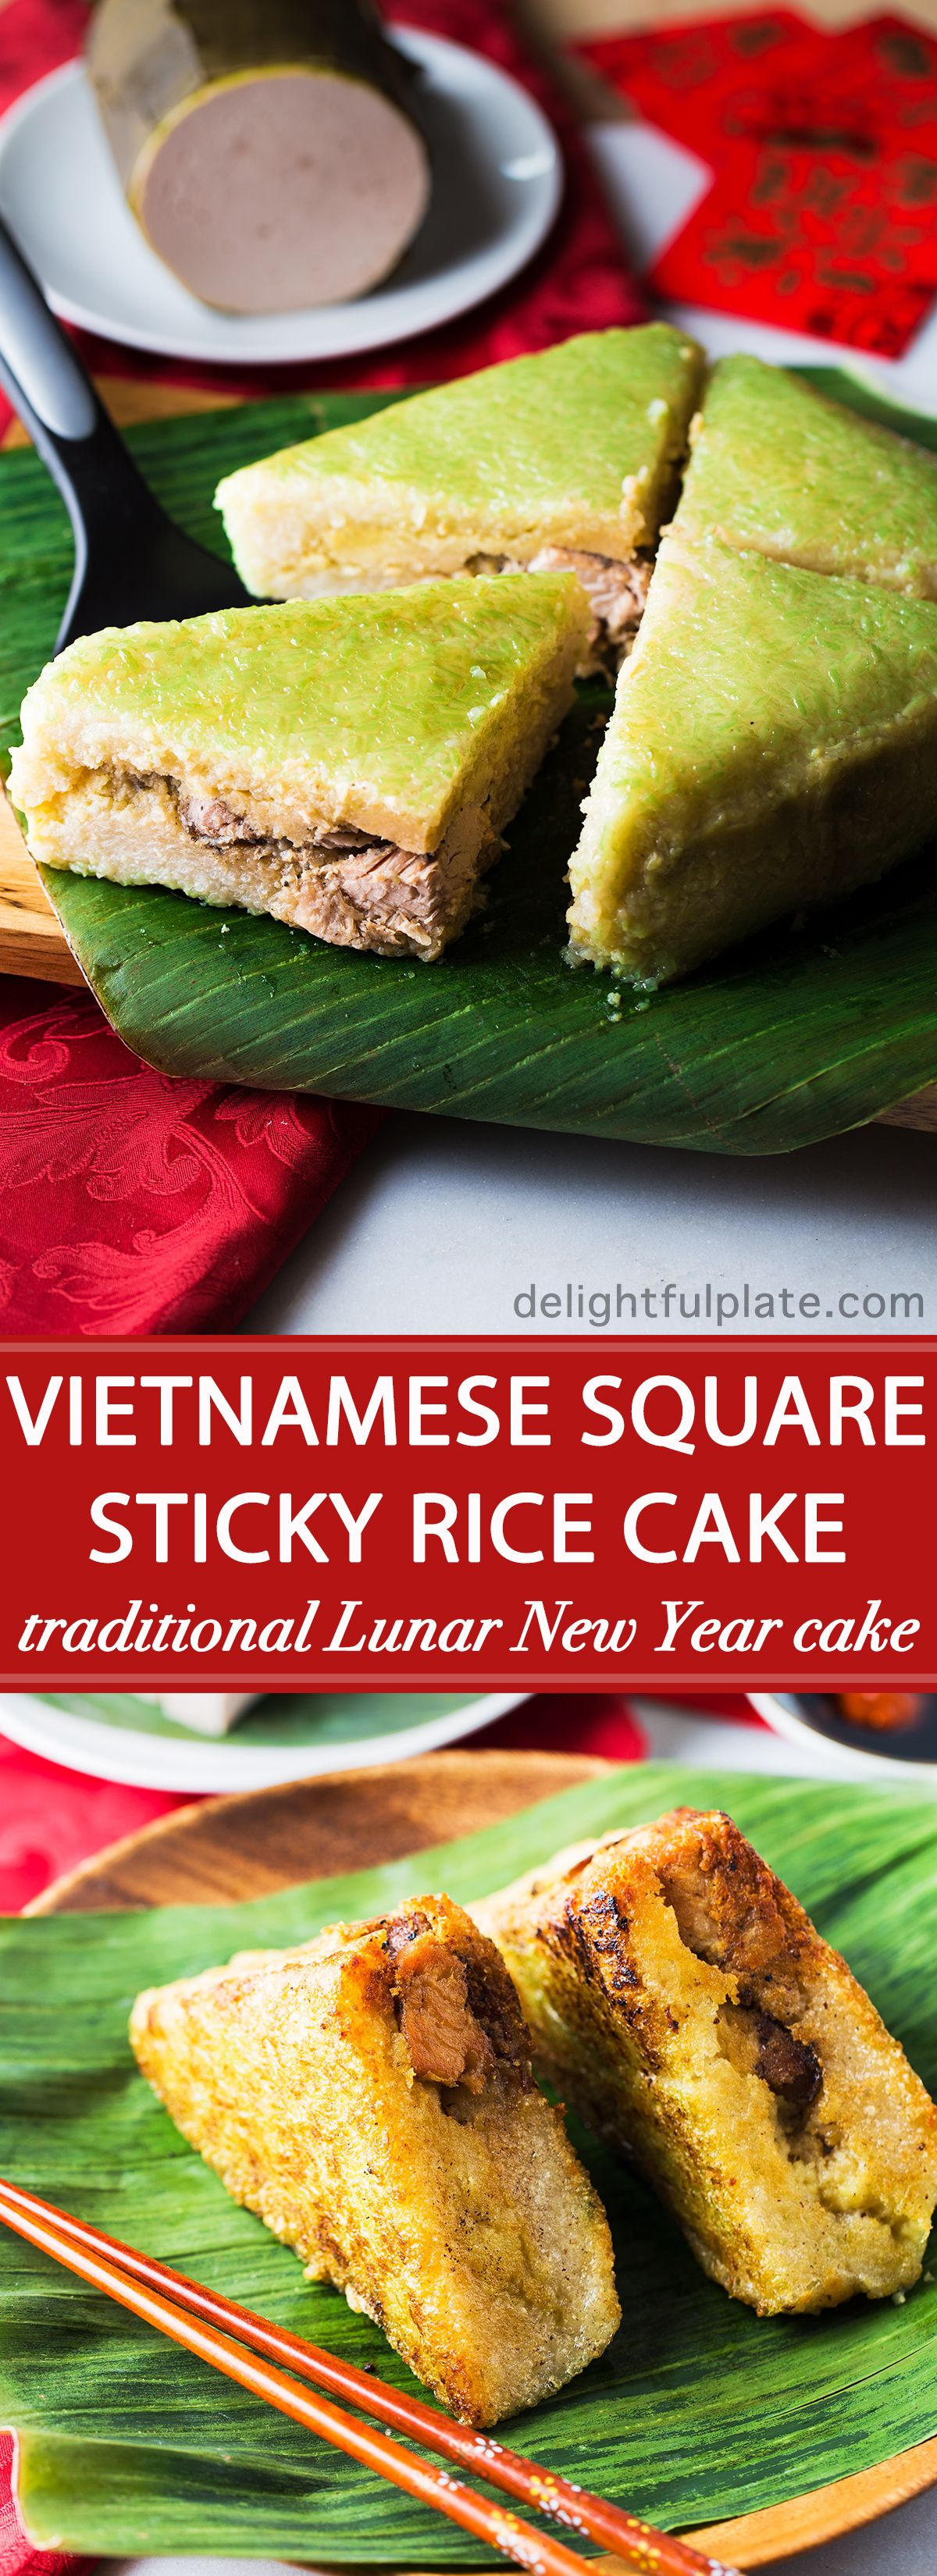 Vietnamese Square Sticky Rice Cake (Banh Chung) Recipe